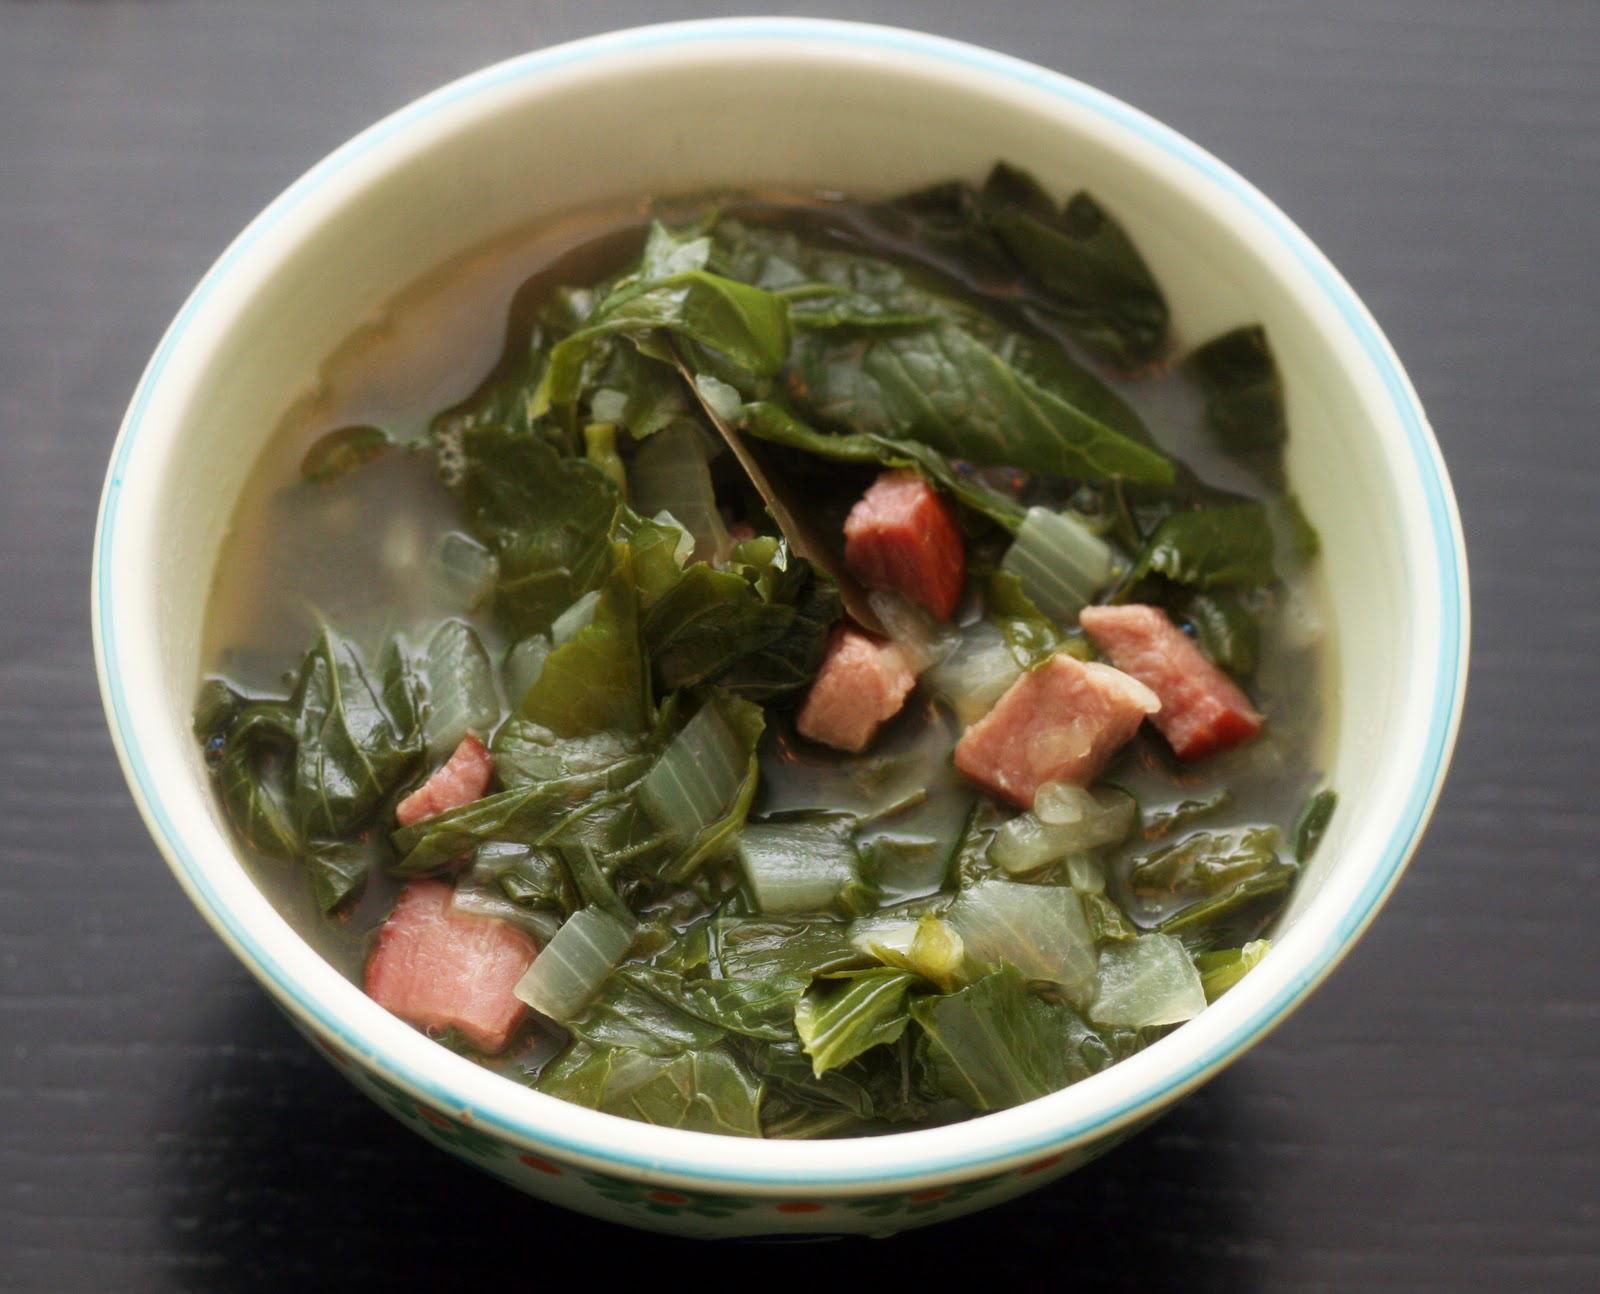 Turnip-greens-recipe-8